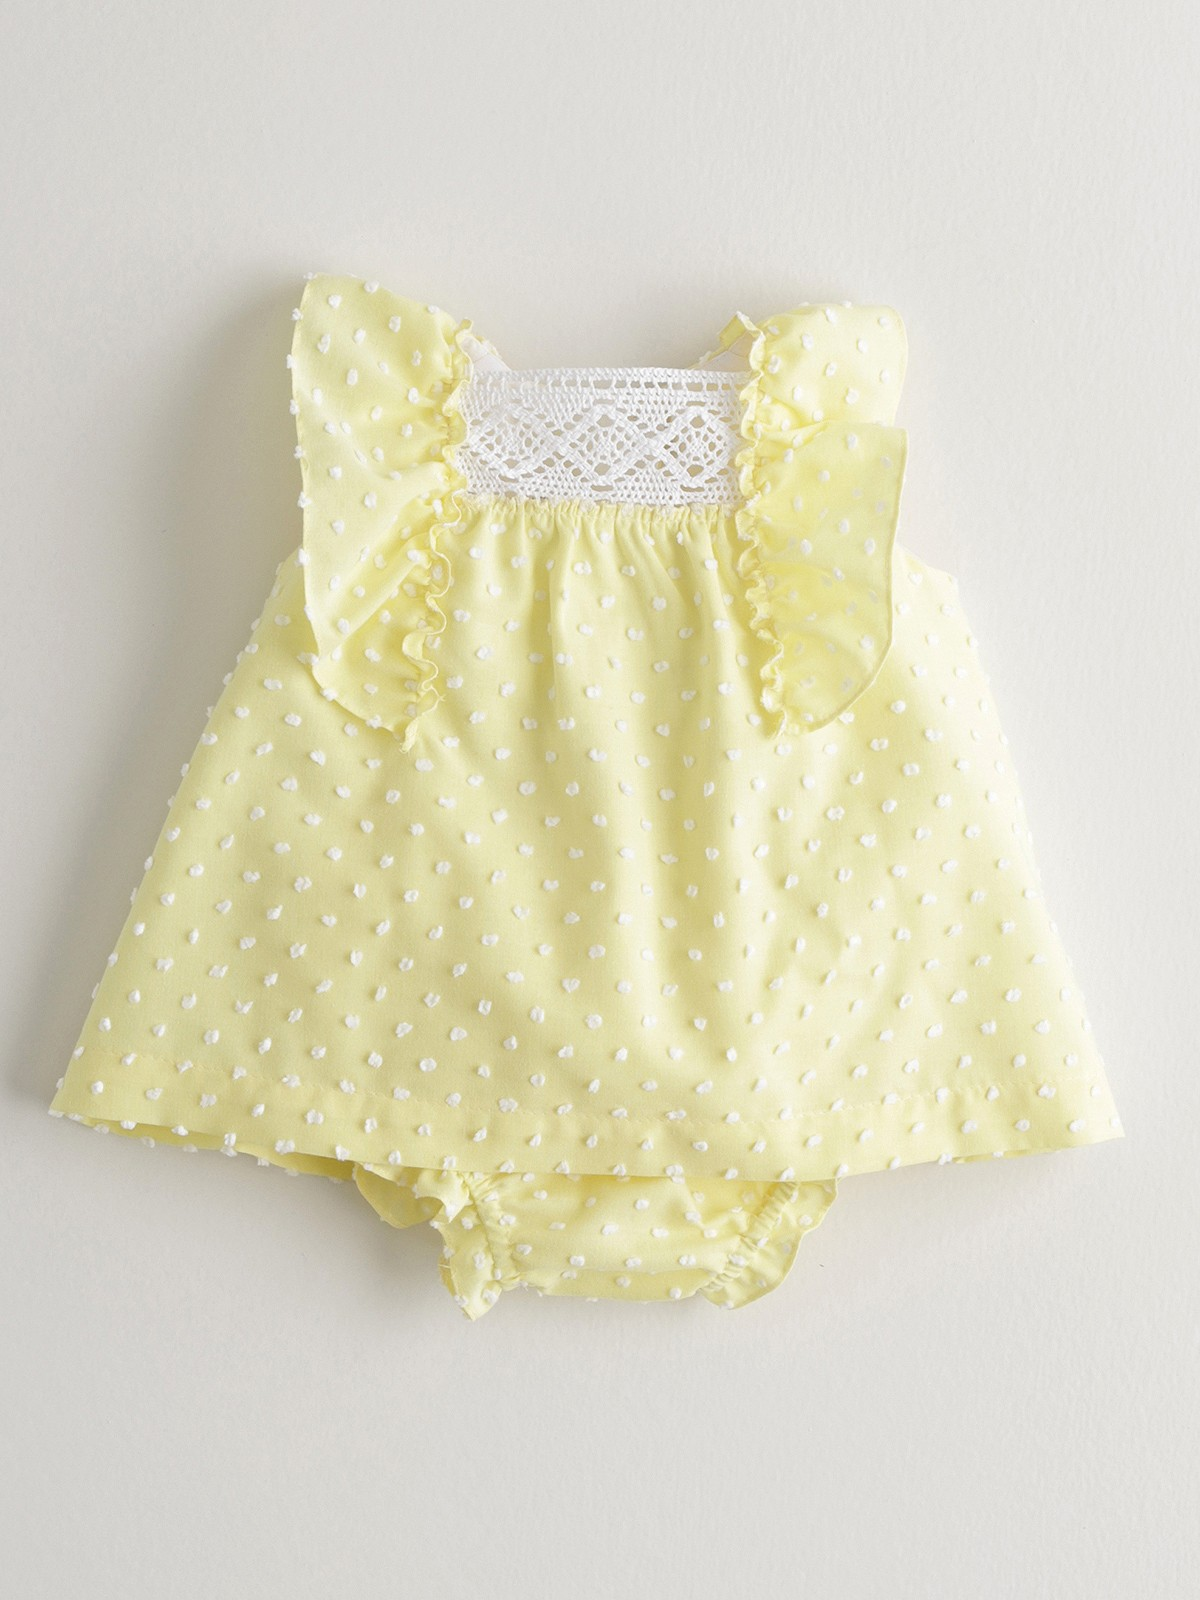 NANOS 黃色羽毛棉套裝